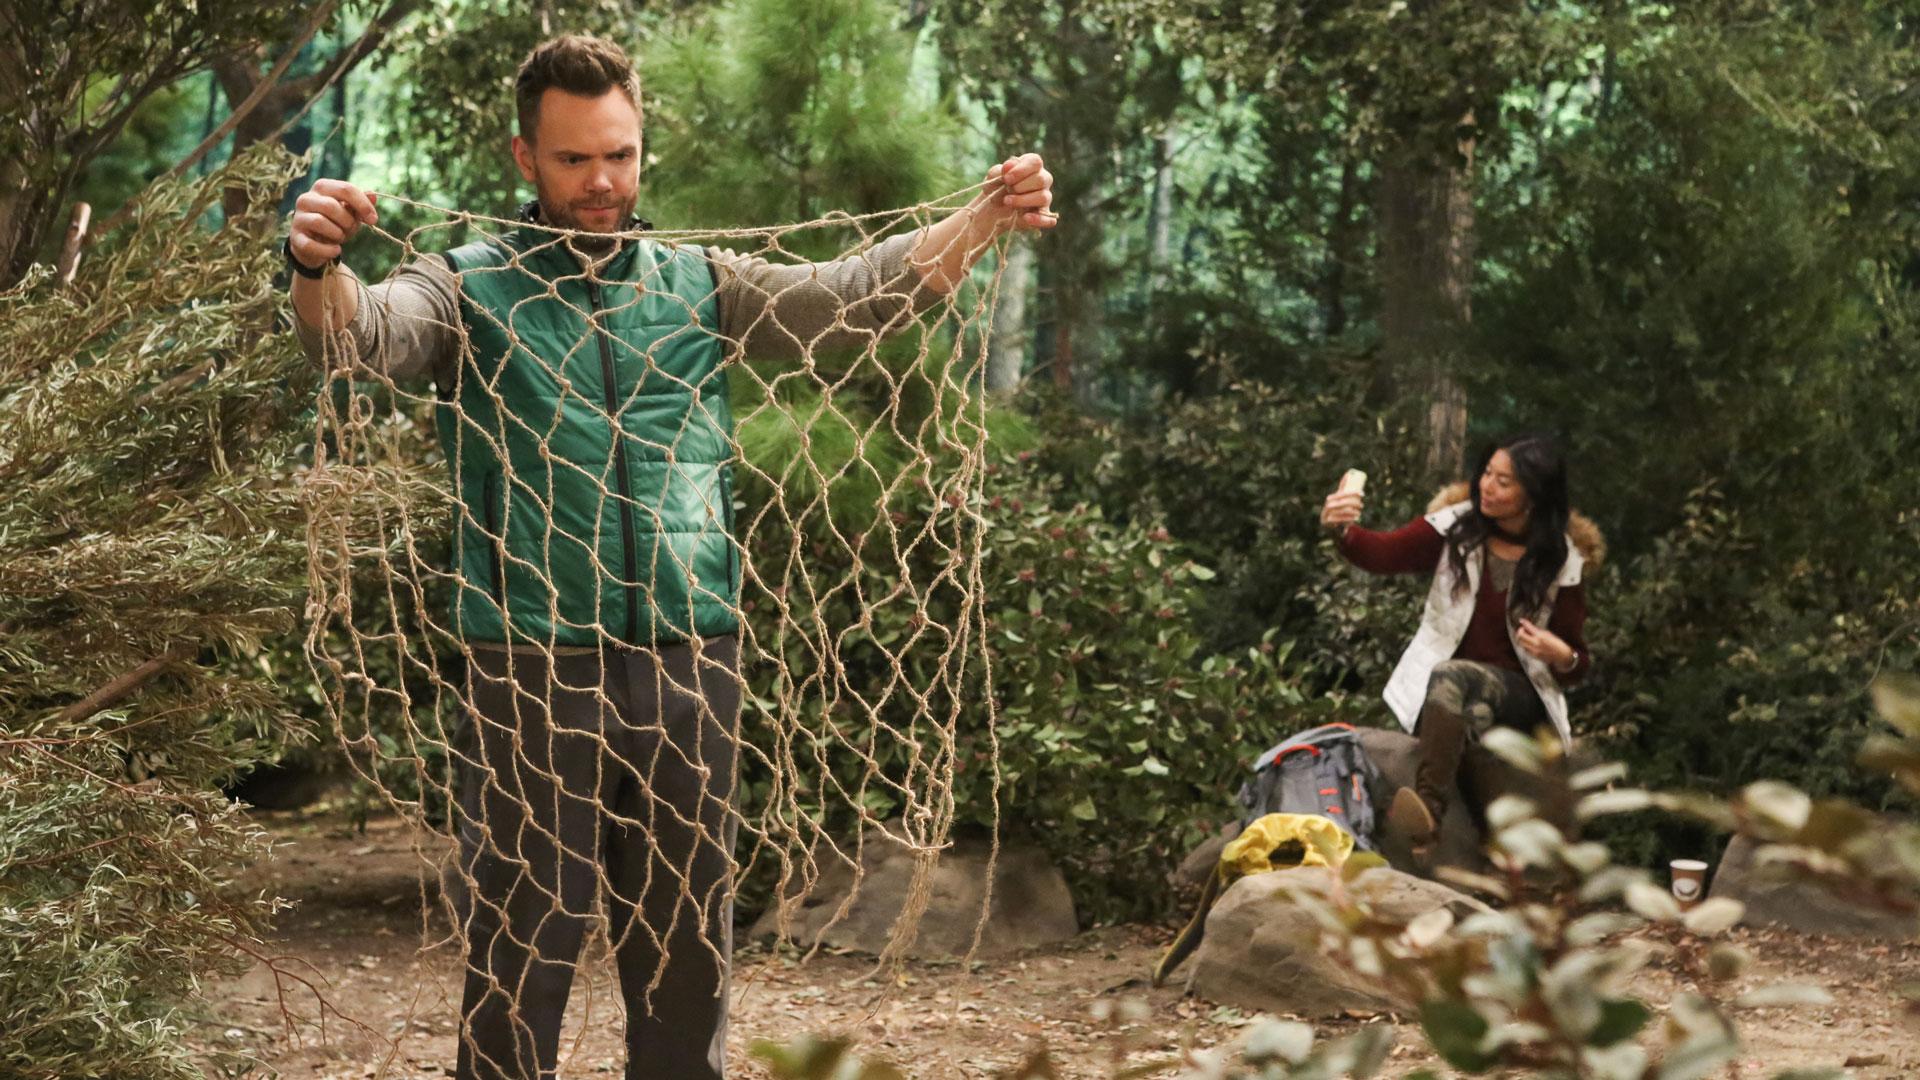 Jack untangles a net while Emma takes a selfie.